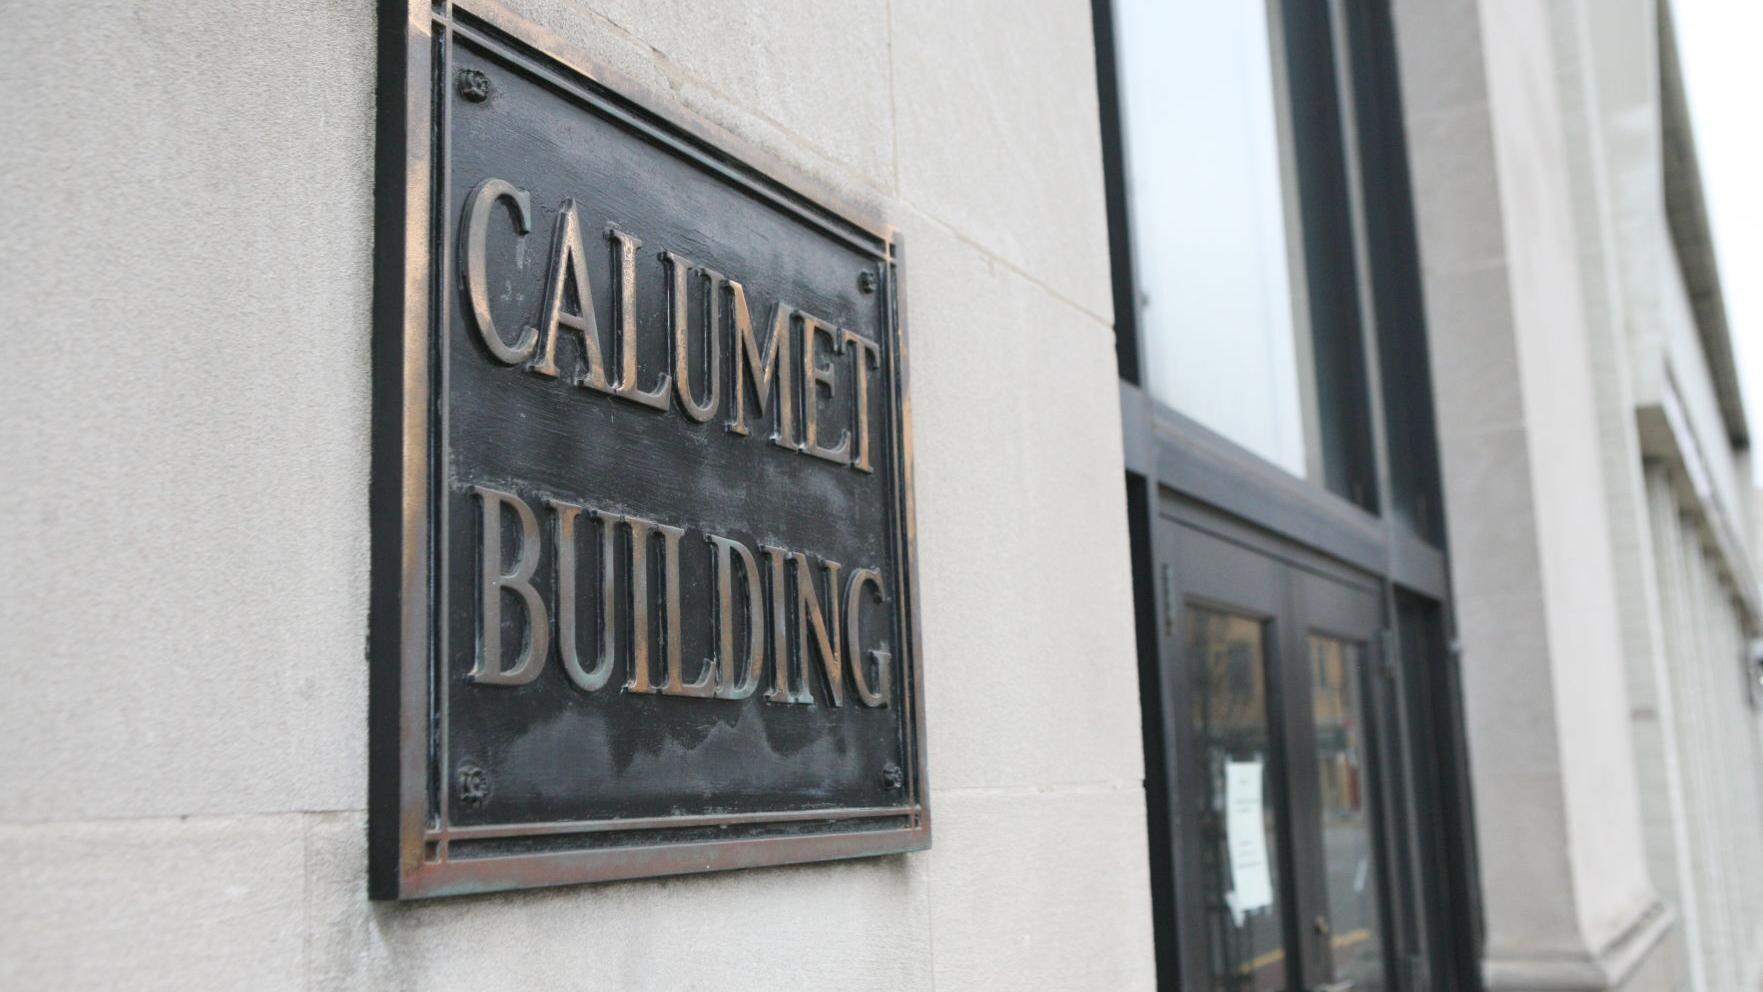 Hammond transit development district eyed as downtown catalyst